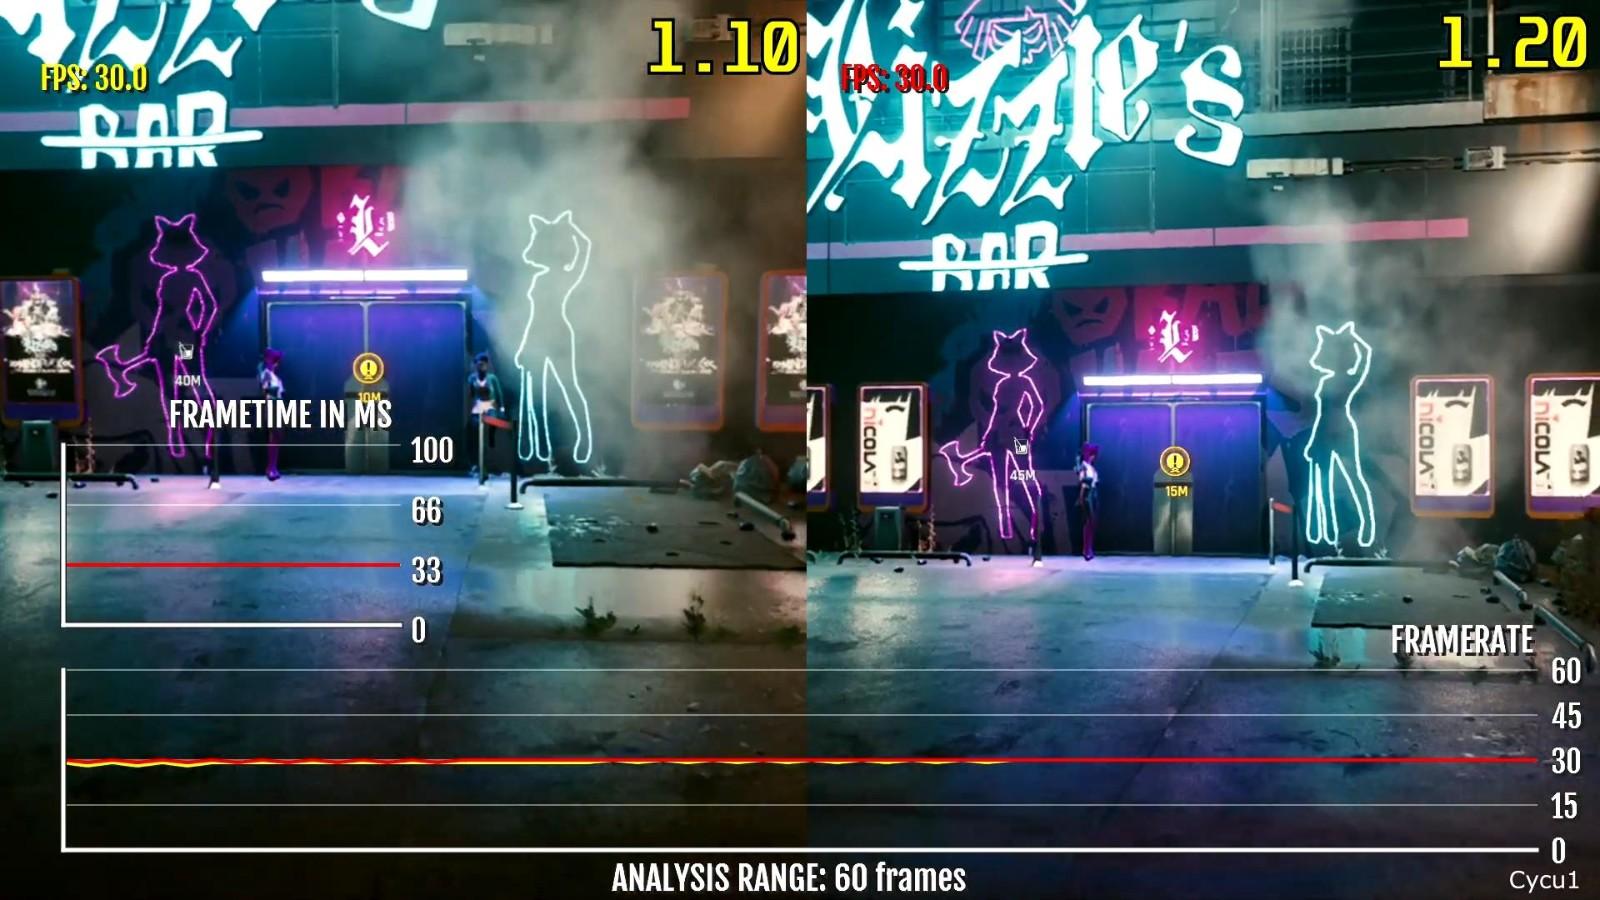 PS4《赛博朋克2077》1.2与1.1版帧数对比 有所改善